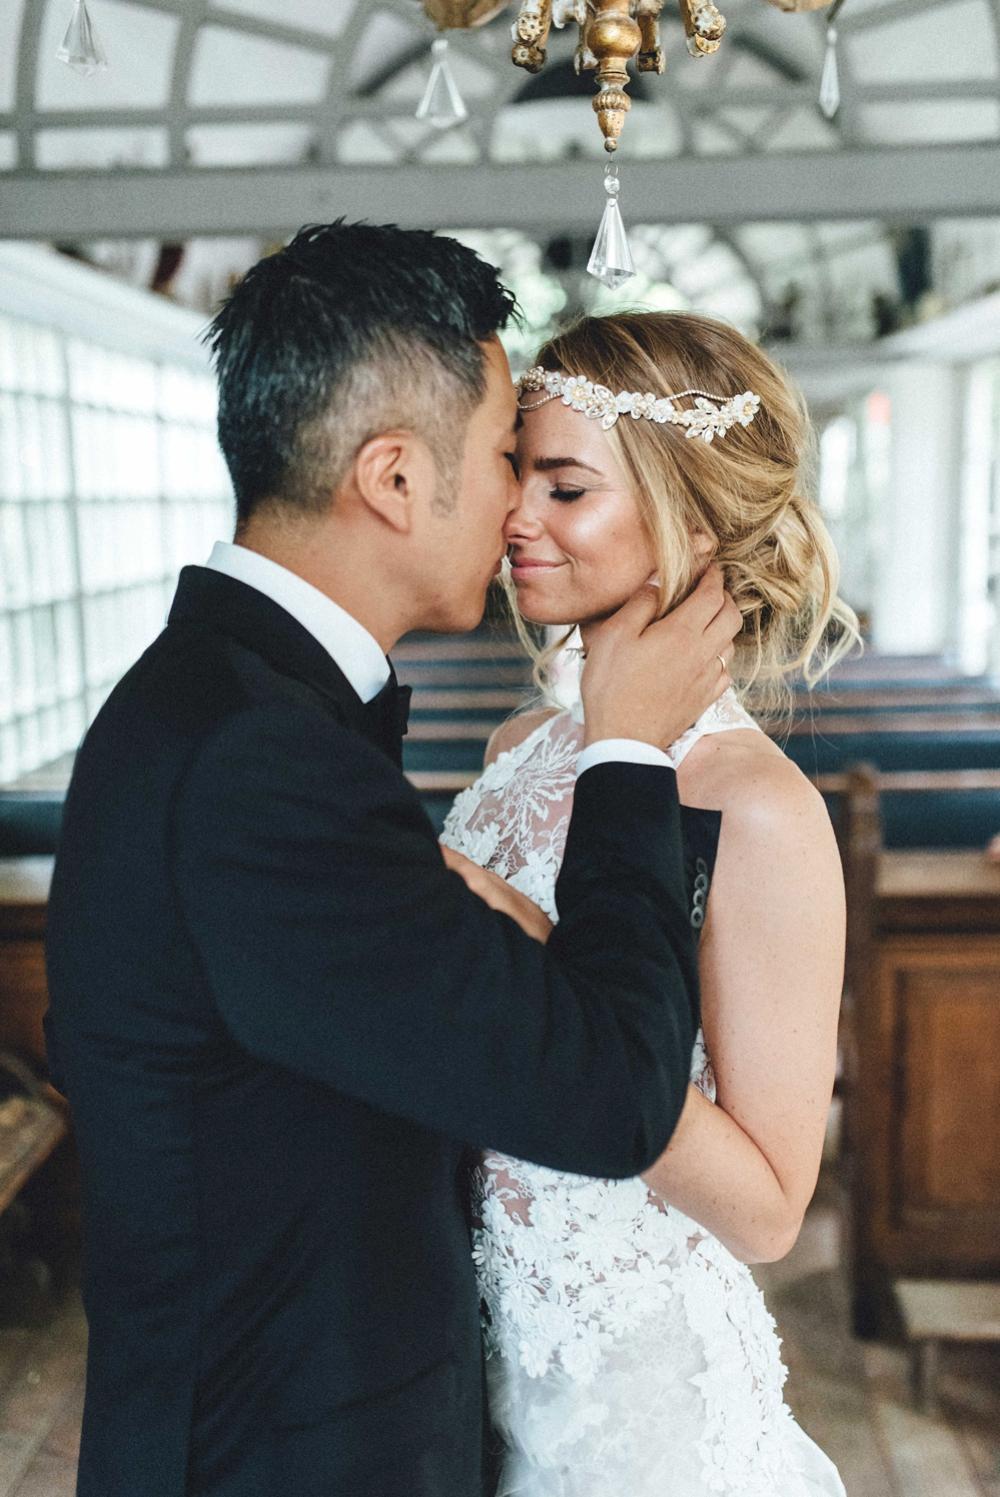 hochzeitsfotograf düsseldorfAnnie & Kazu emotionale Hochzeit in Düsseldorfbohemian emotional wedding nrw 1395